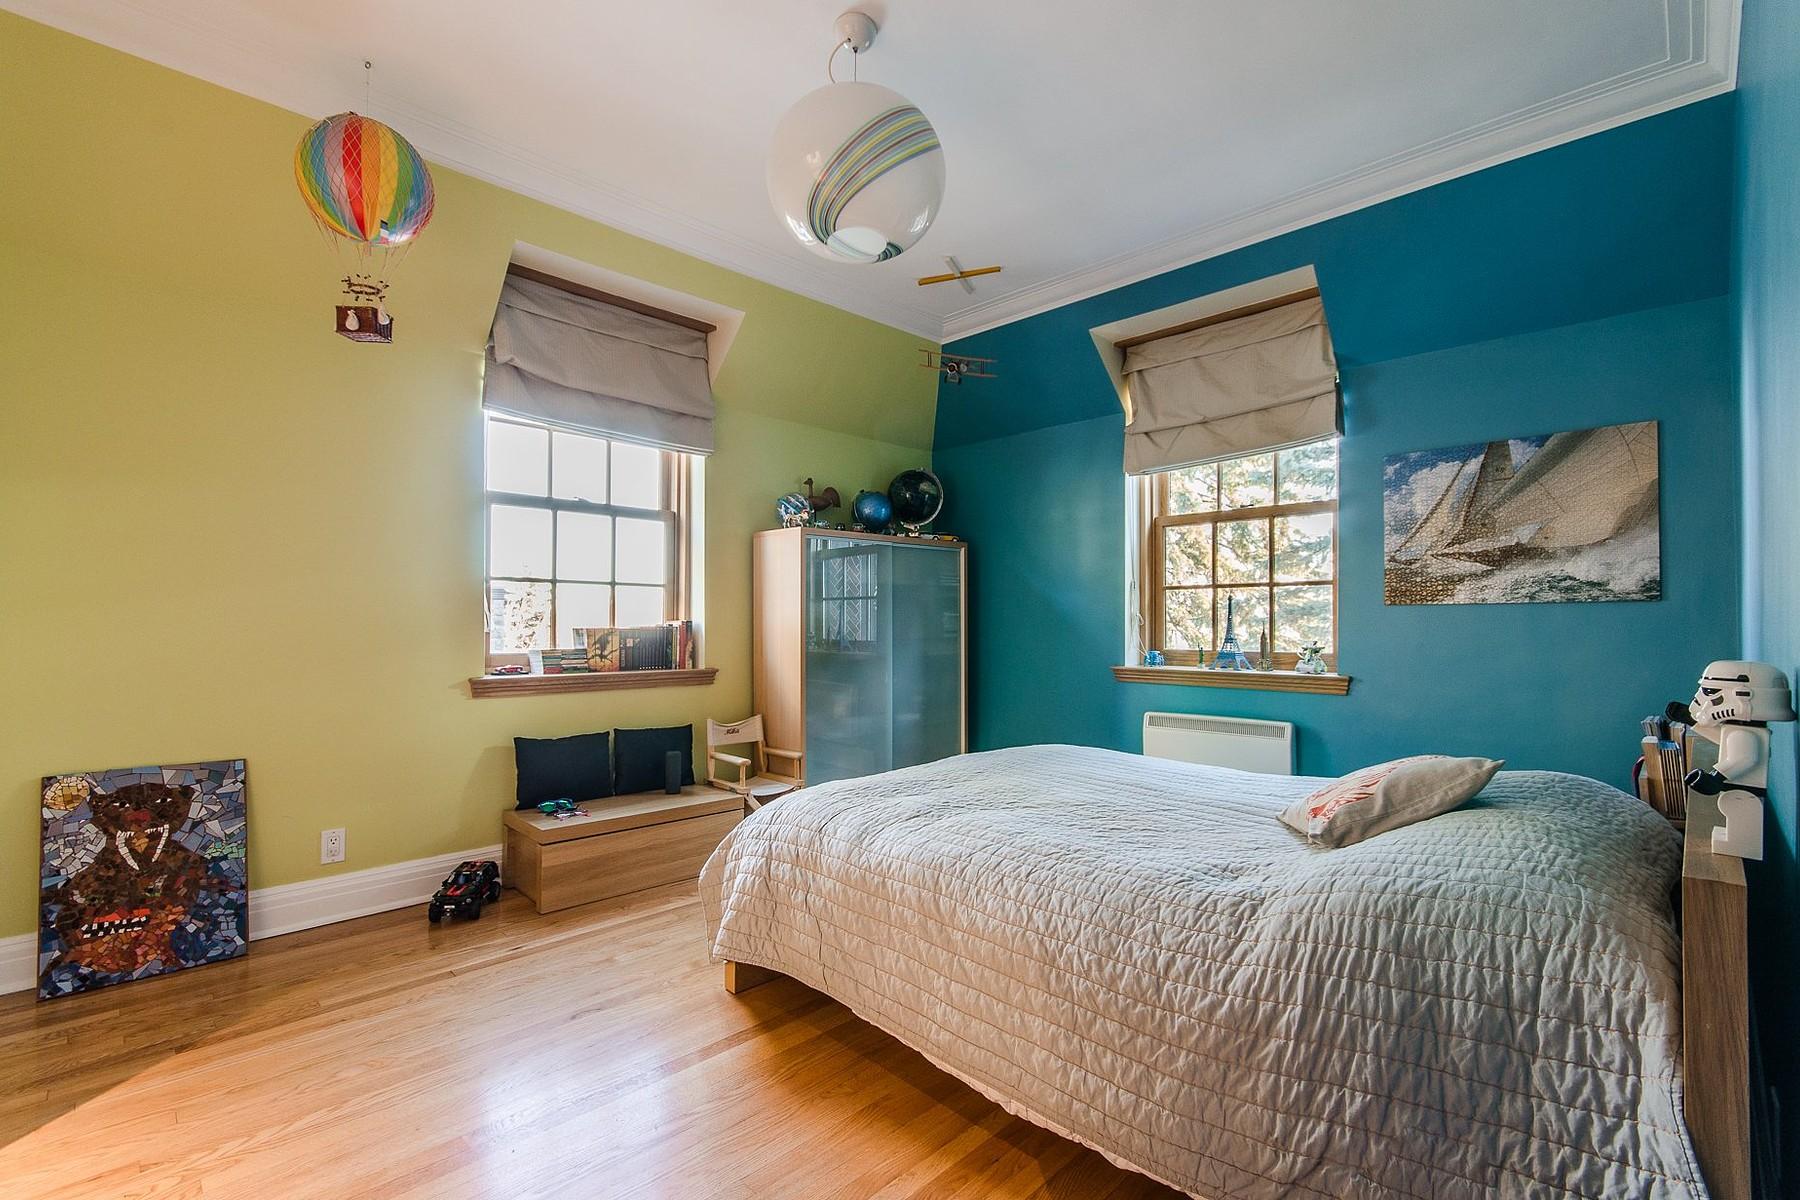 Additional photo for property listing at Westmount, Montréal 753 Av. Lexington Westmount, Quebec H4W1P1 Canada